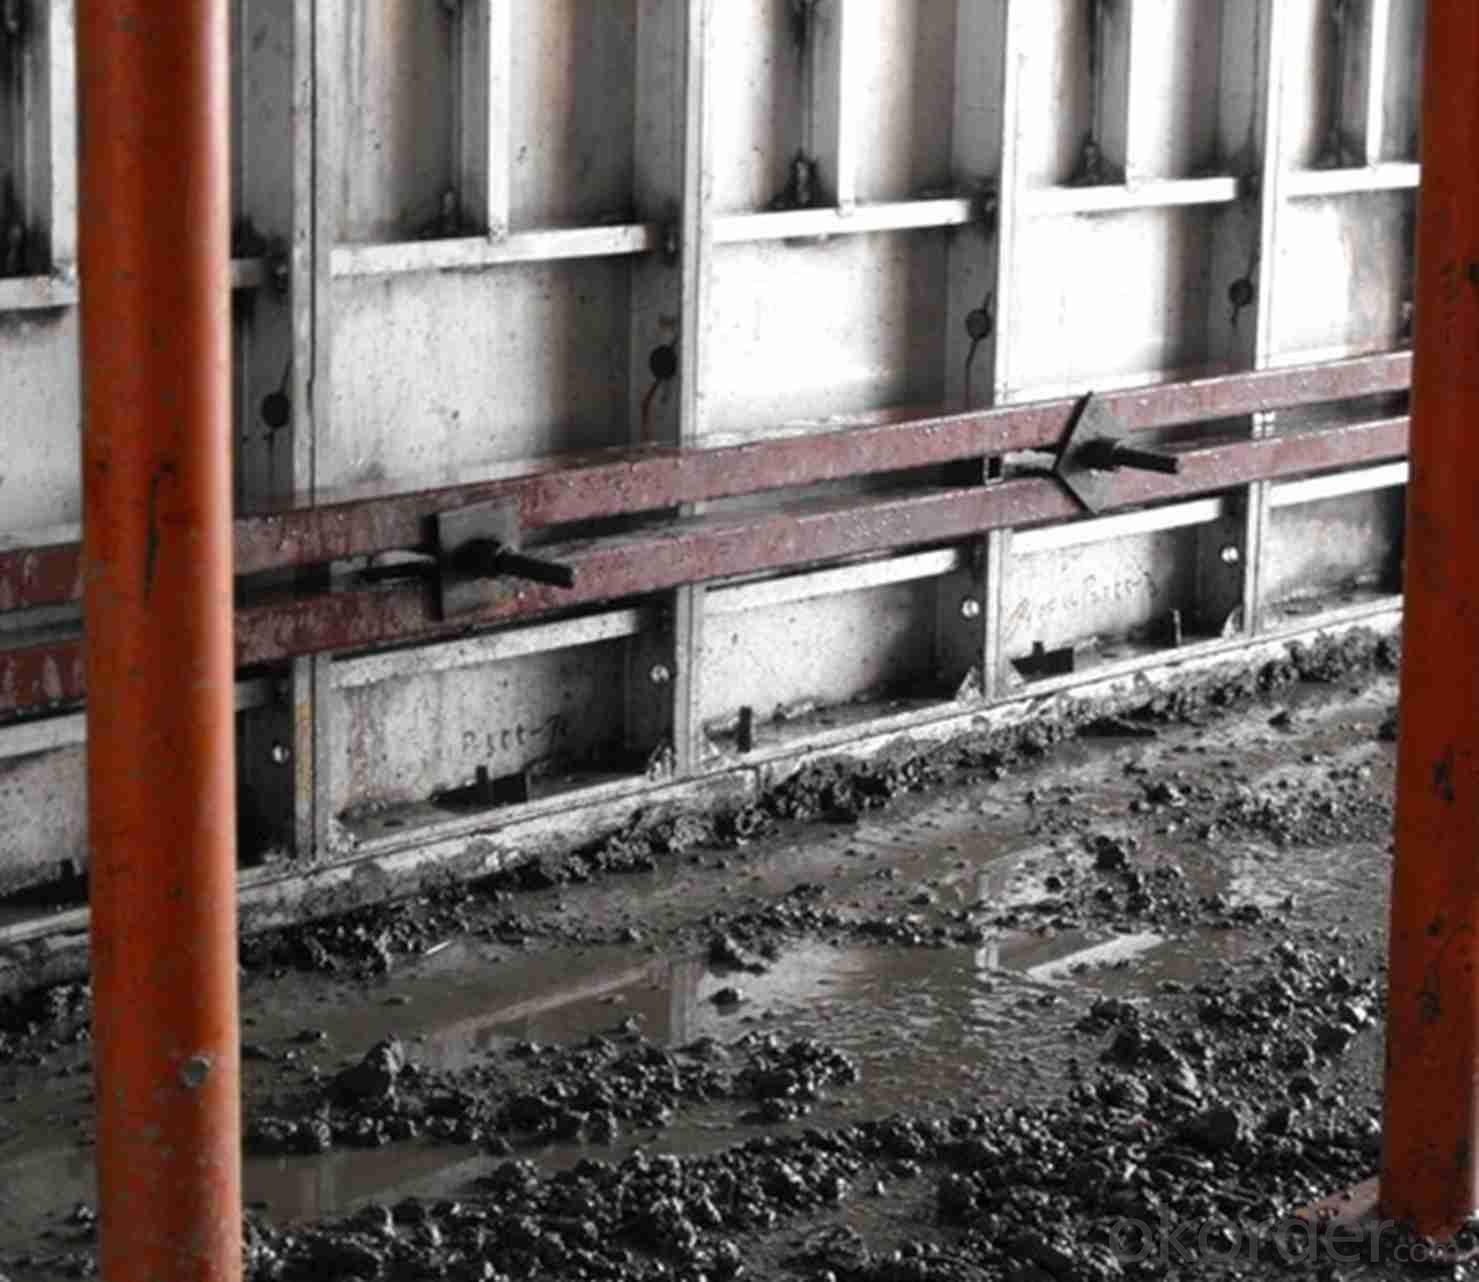 Whole Aluminum Formwork System for Slab Floor Construction